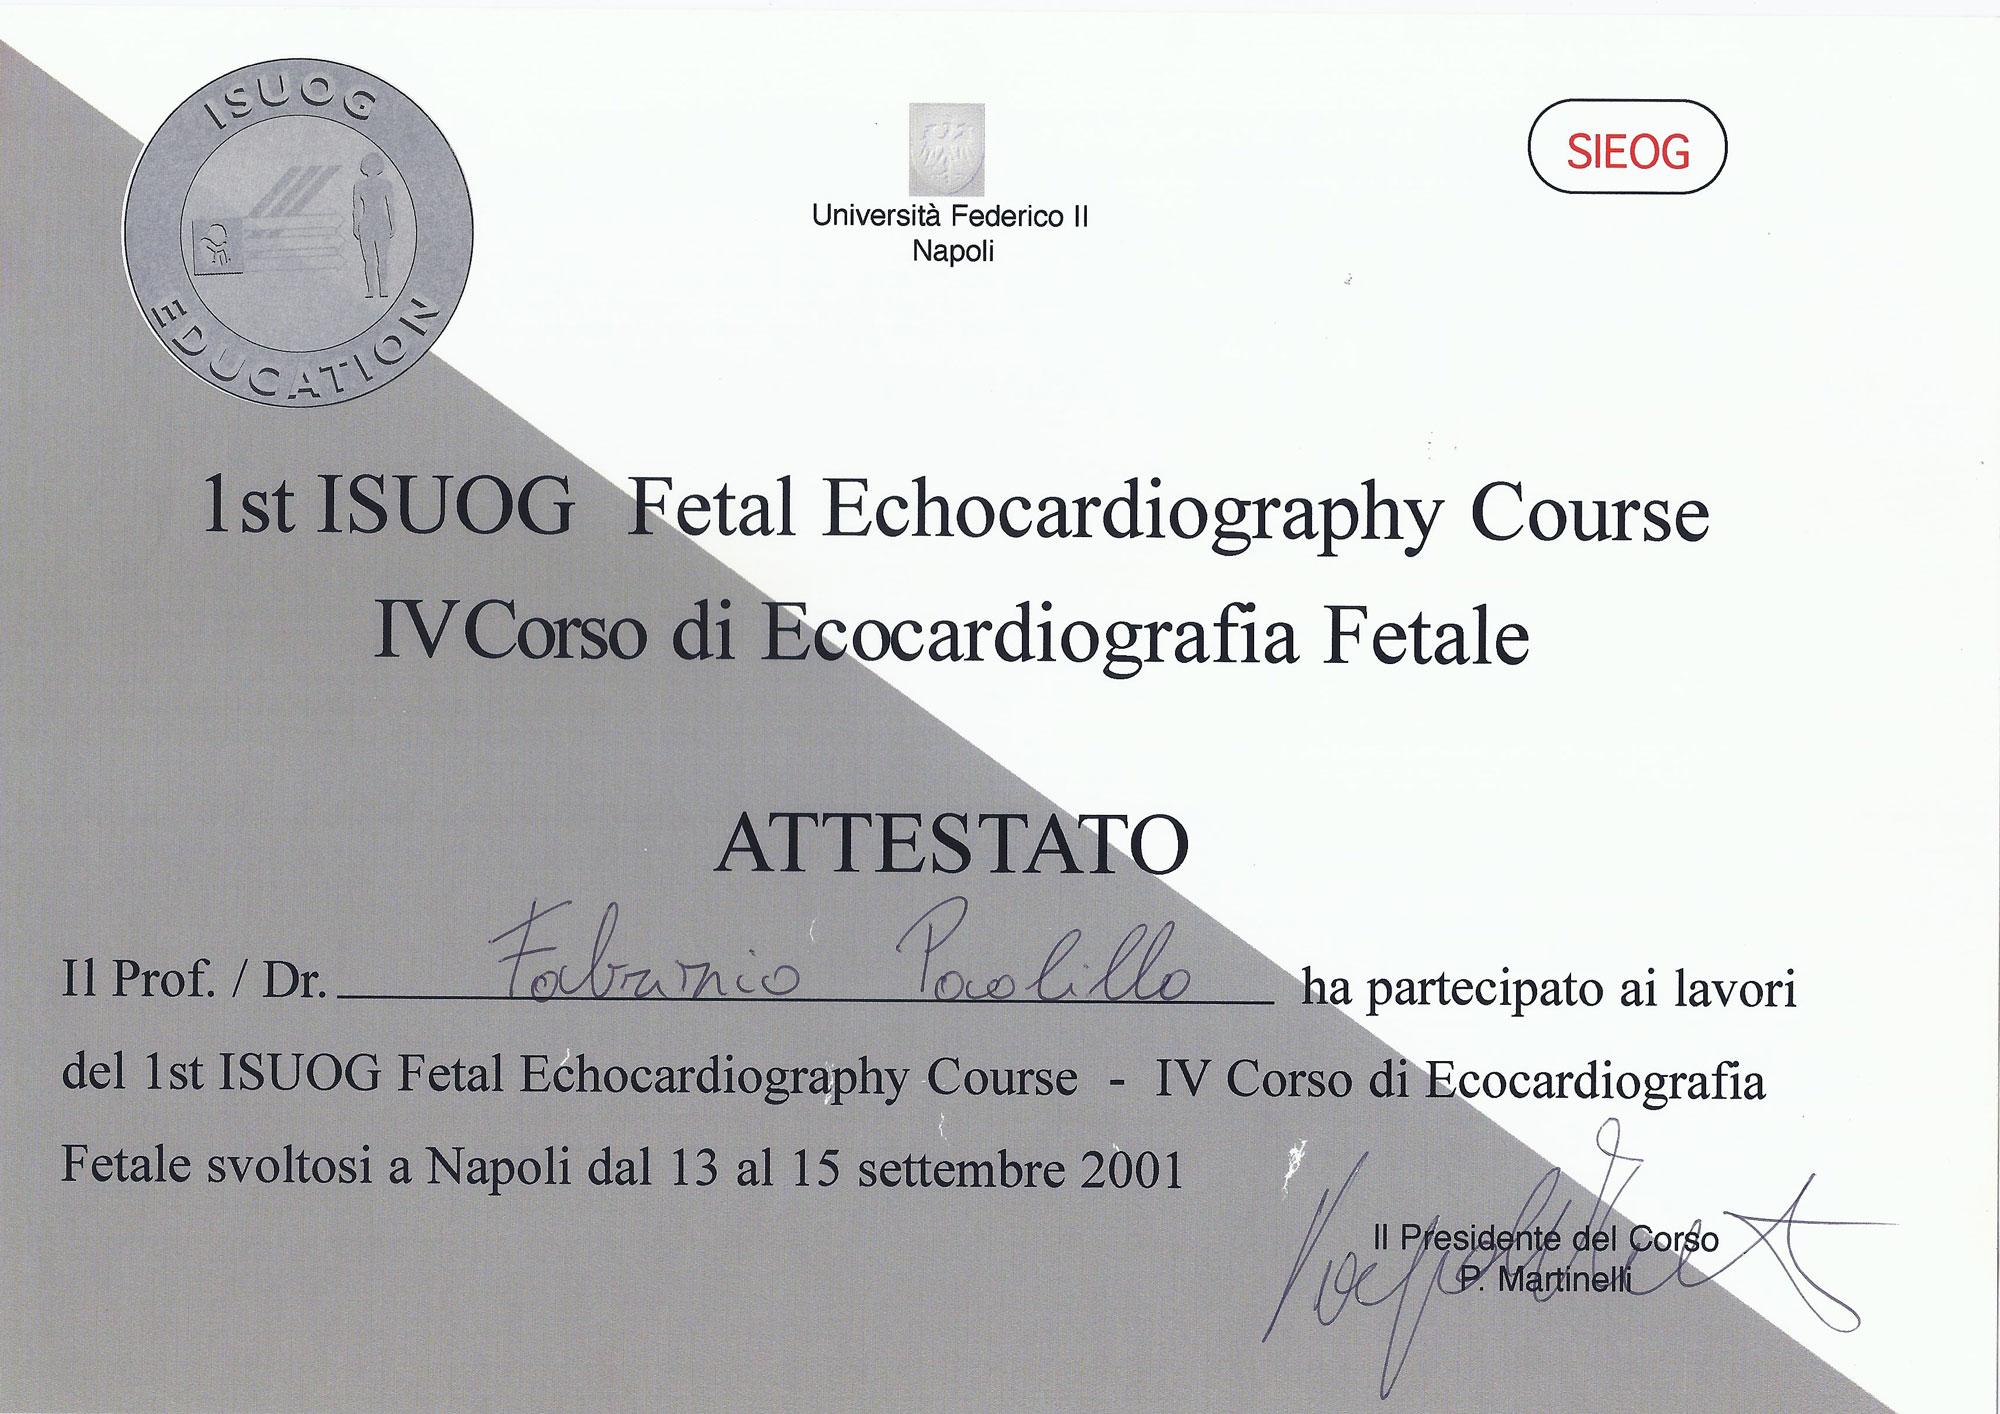 1st ISUOG Fetal Echocardiography Course - IV Corso di Ecocardiografia Fetale